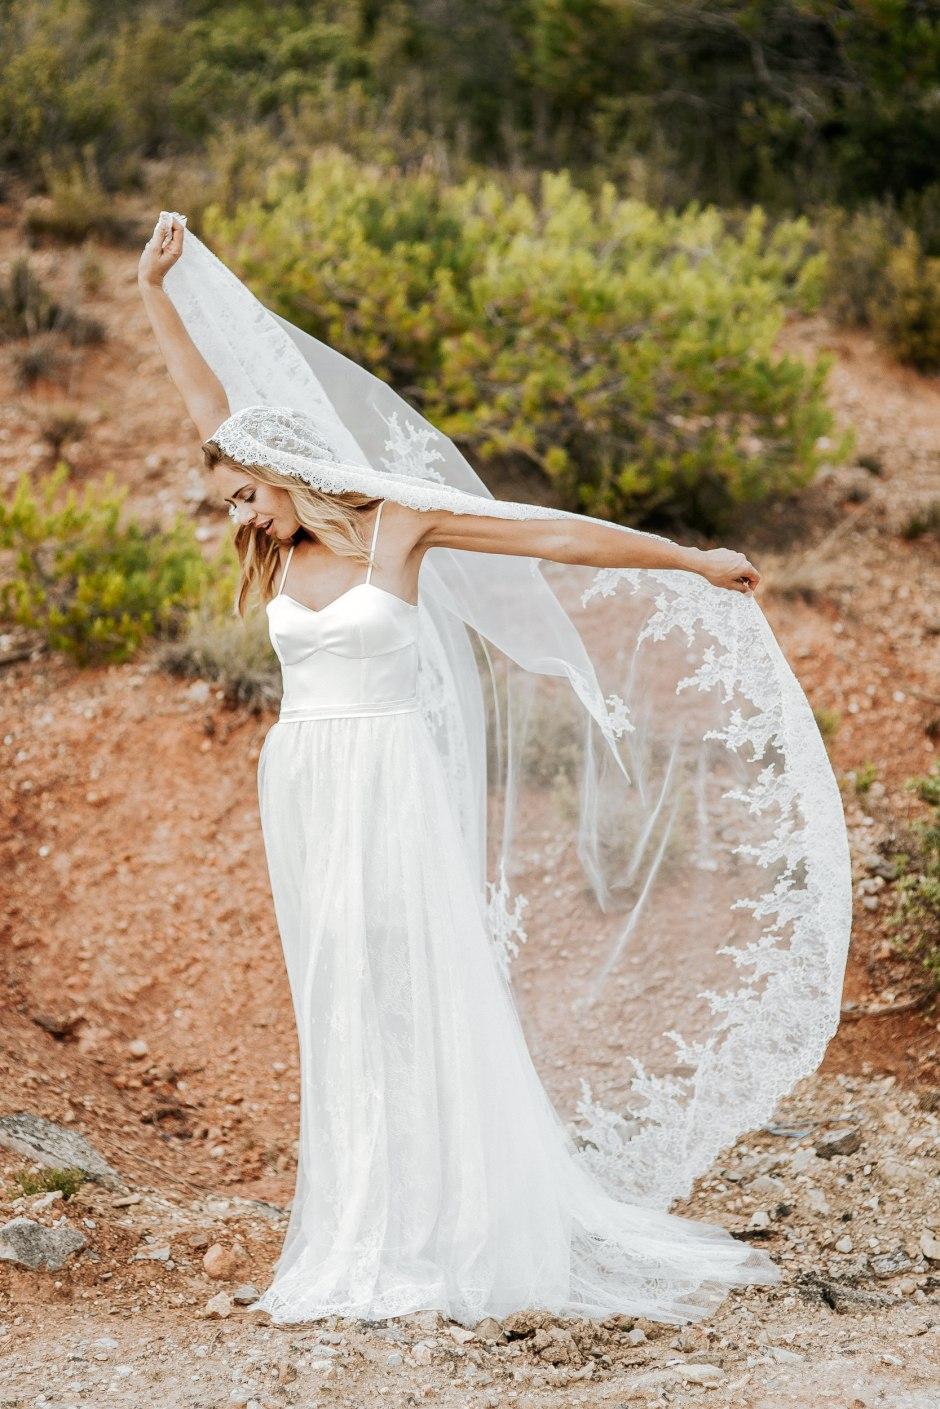 elisa-ness-la-blogueuse-mariage-39